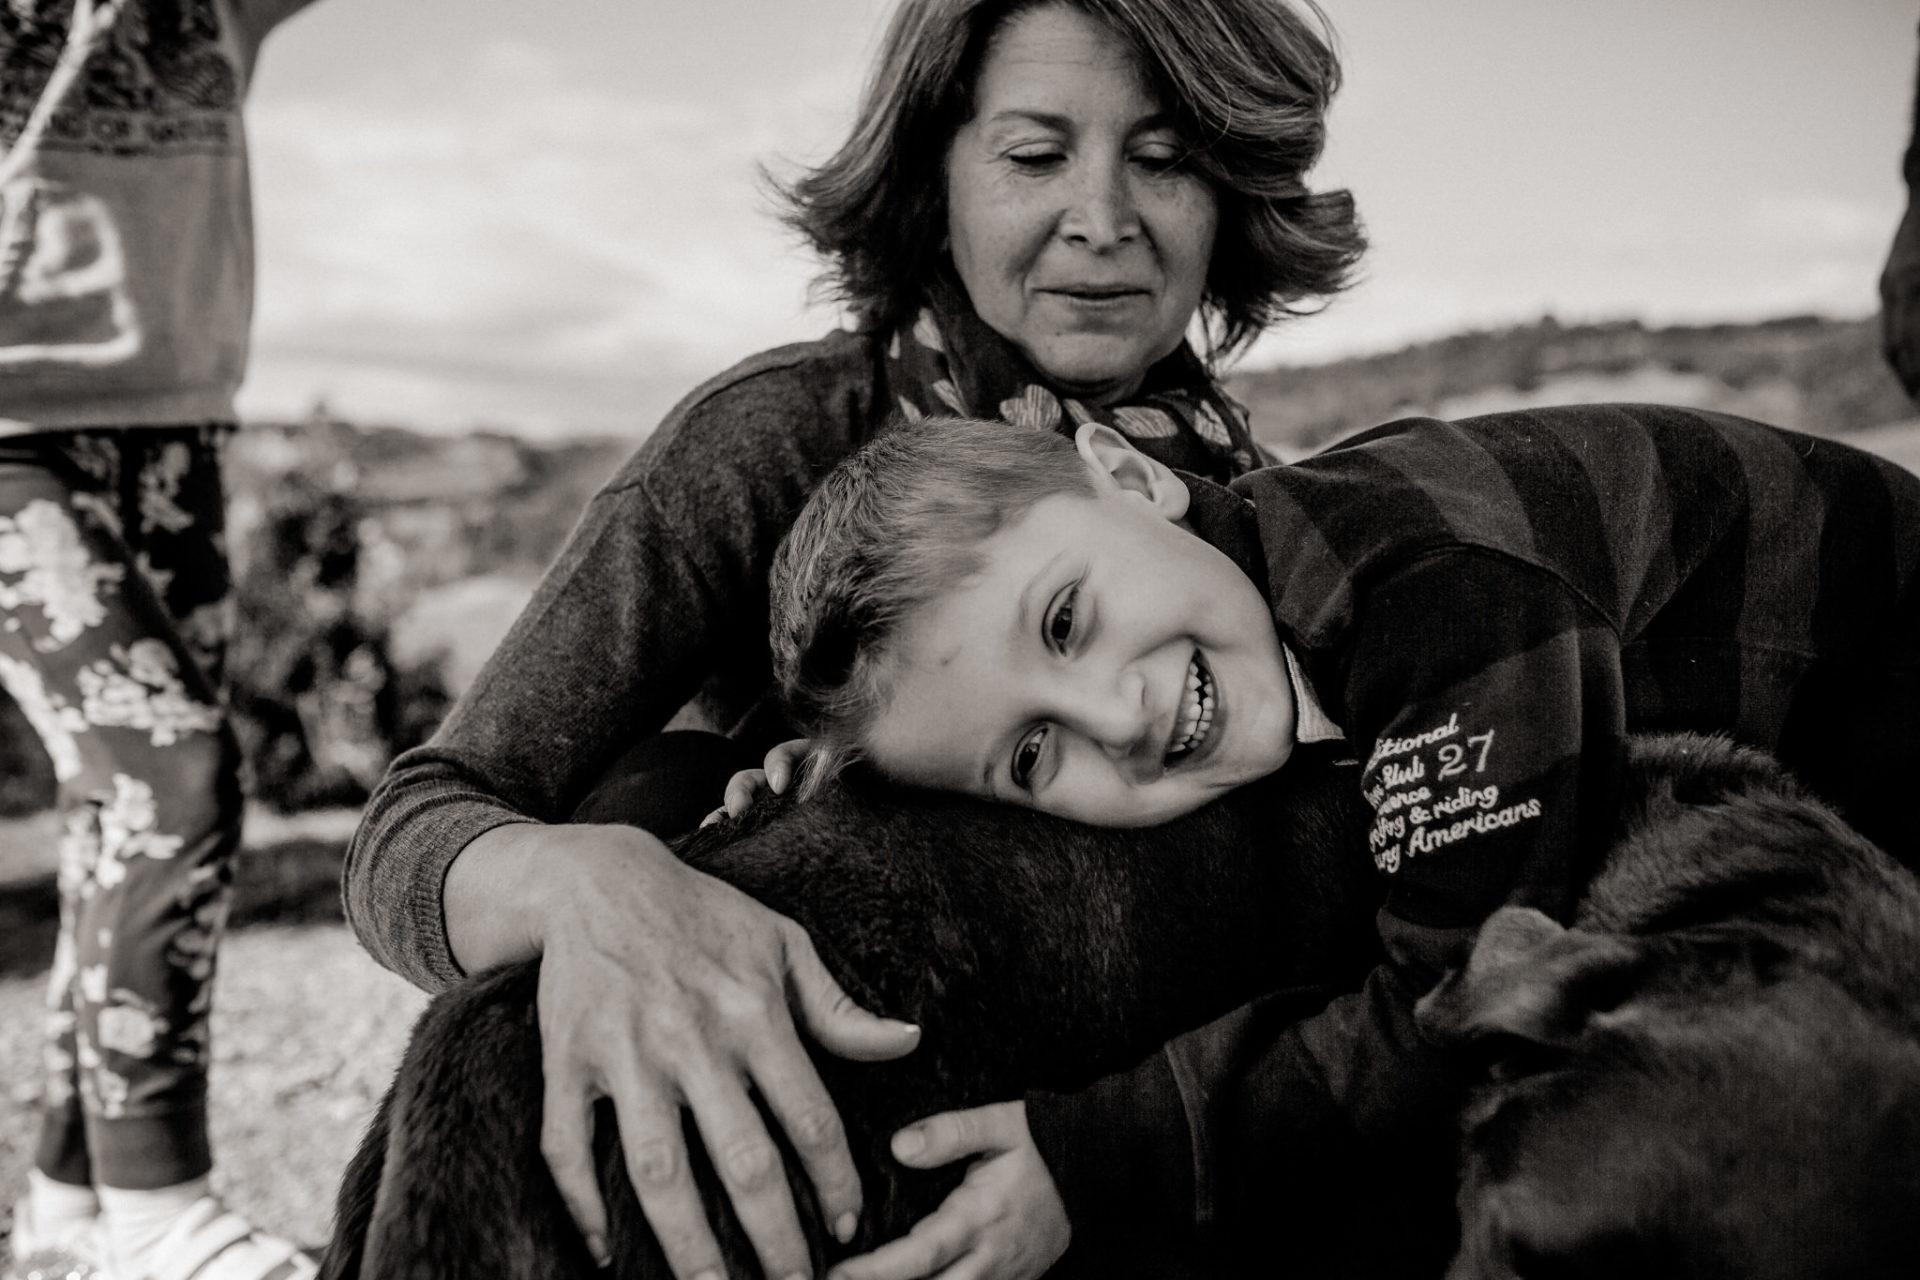 Familienbilder Urlaub-Family Fusion Italien-lebhafte Familie-italienischer Spirit-Dimora Santa Margherita-Ungestellte Familienbilder-familienfotograf Stuttgart